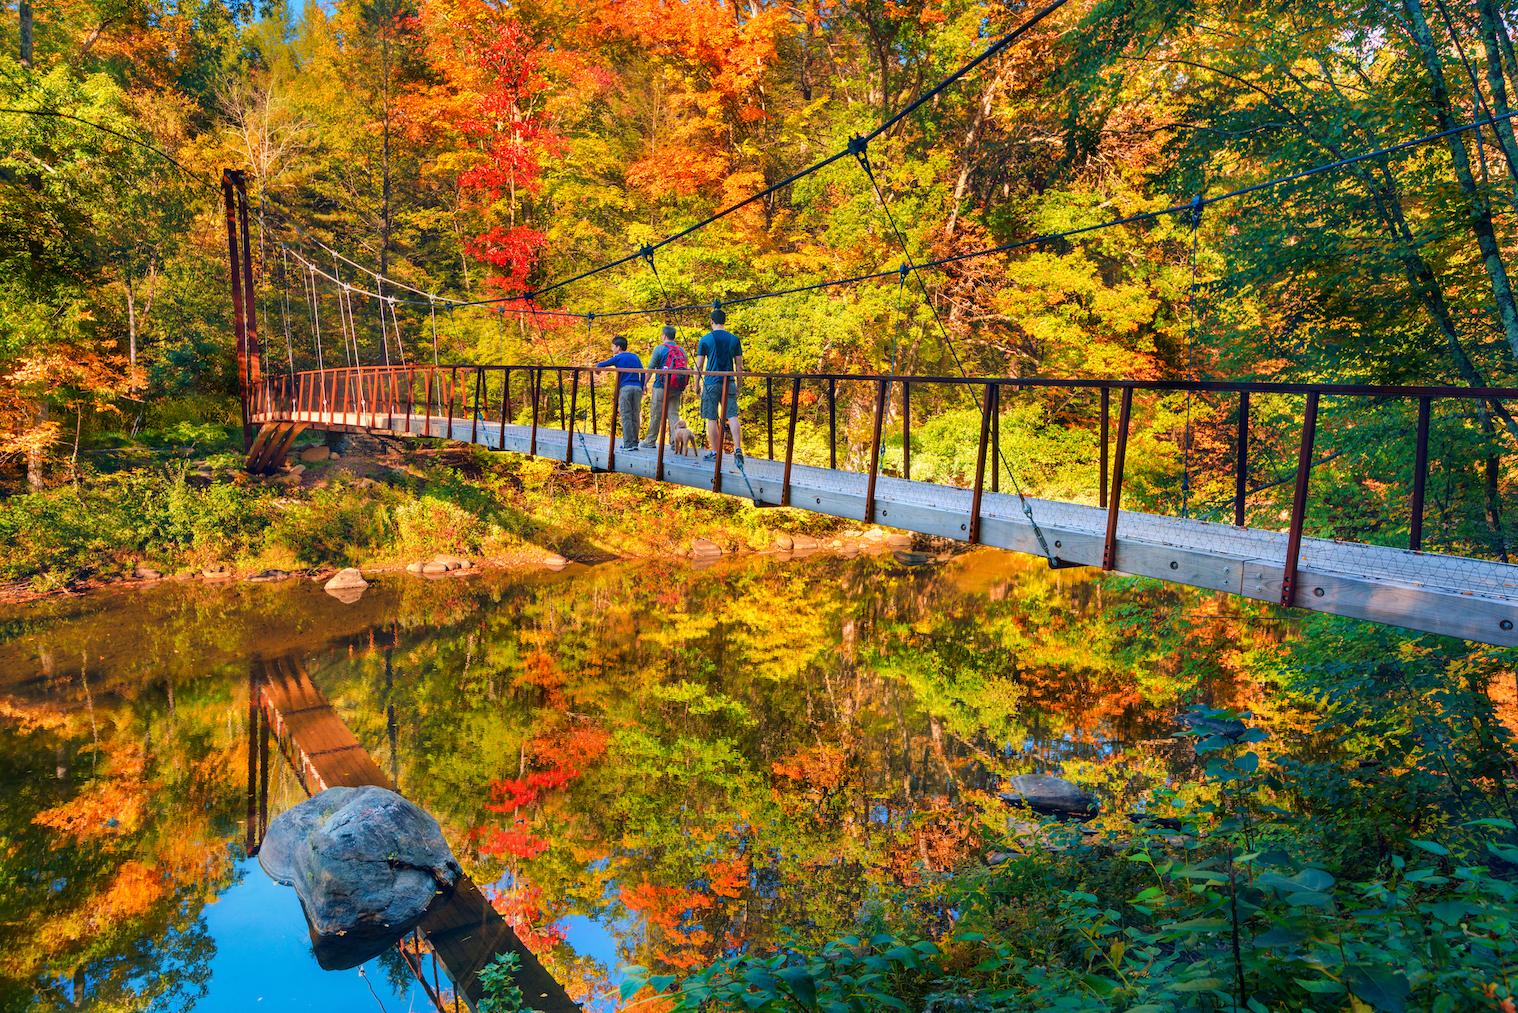 Vibrant Fall Foliage Seasonal Experiences Set To Wow